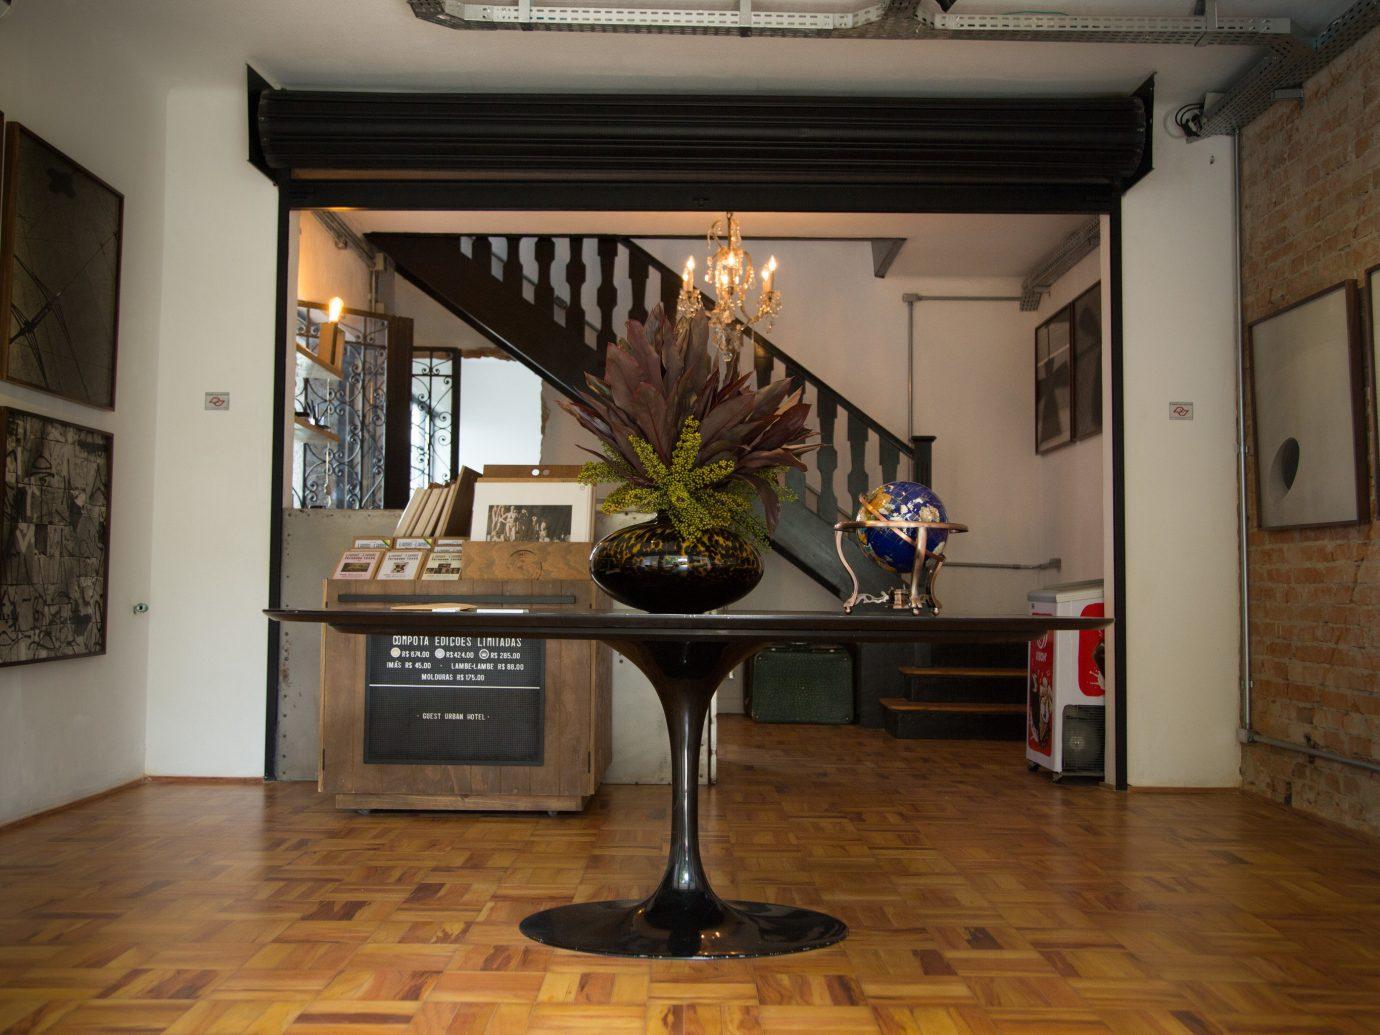 Hotels floor indoor building interior design table flooring furniture Lobby